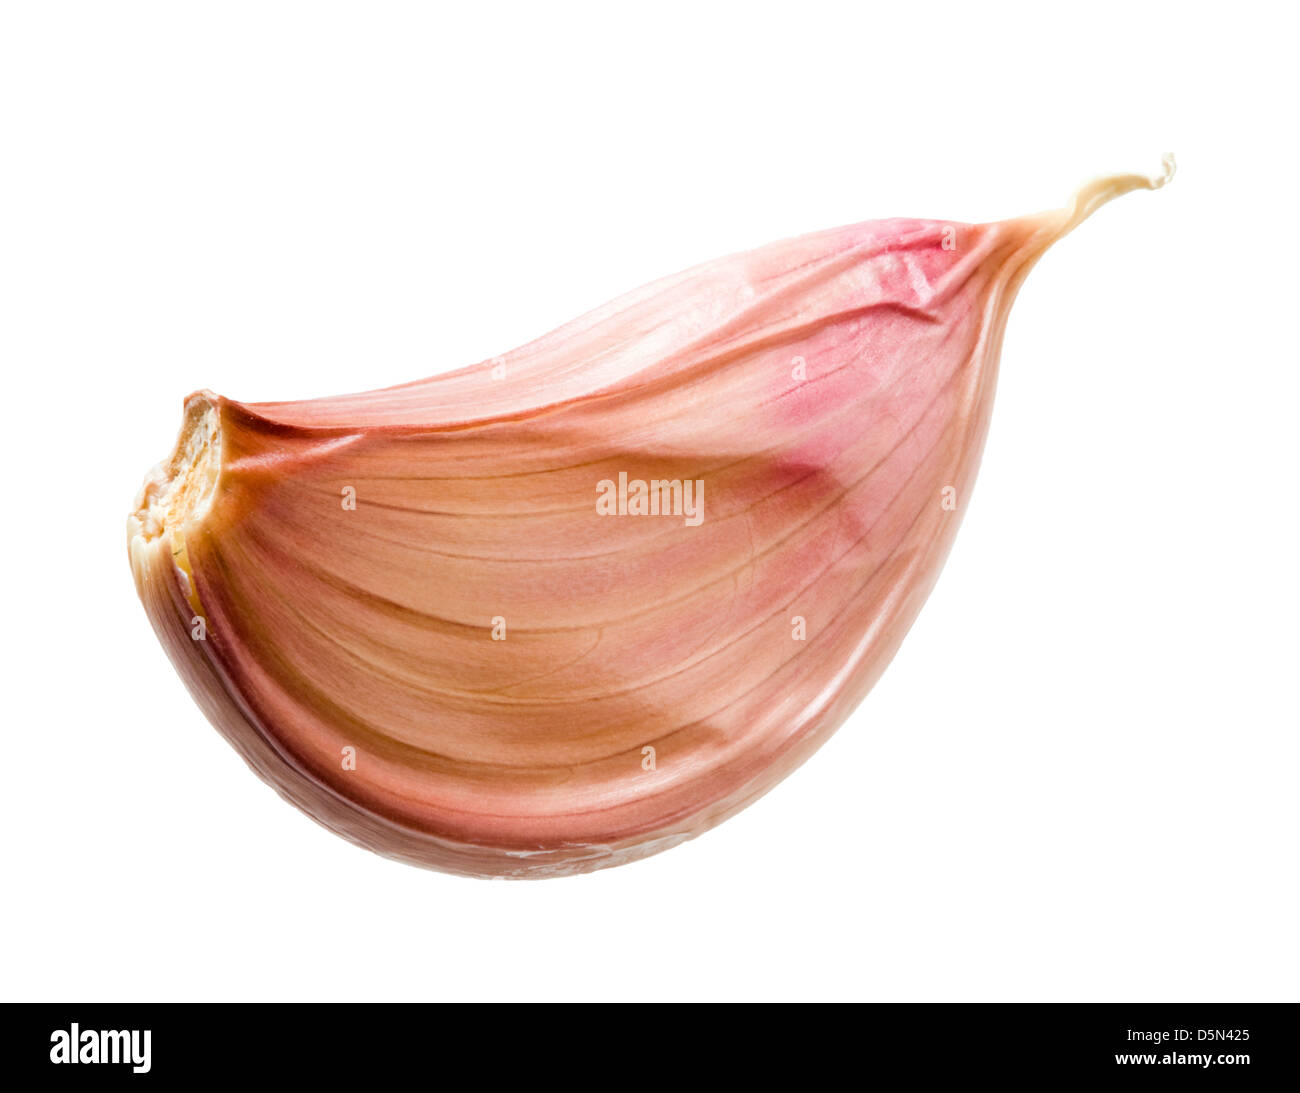 Garlic clove. - Stock Image